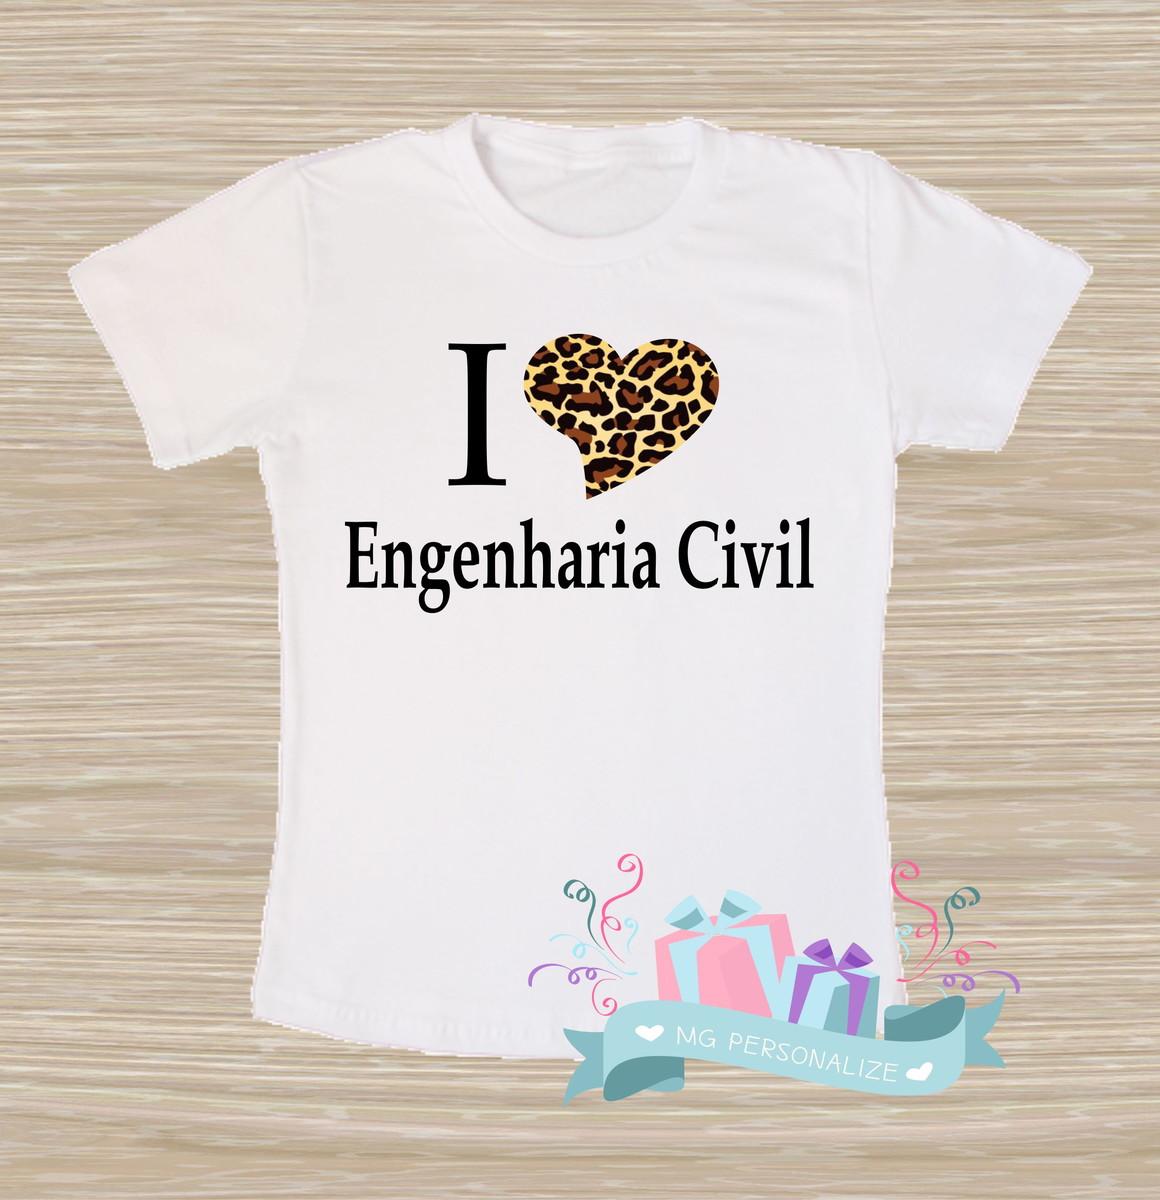 253c72e2d524e camiseta psicologia personalizada no Elo7